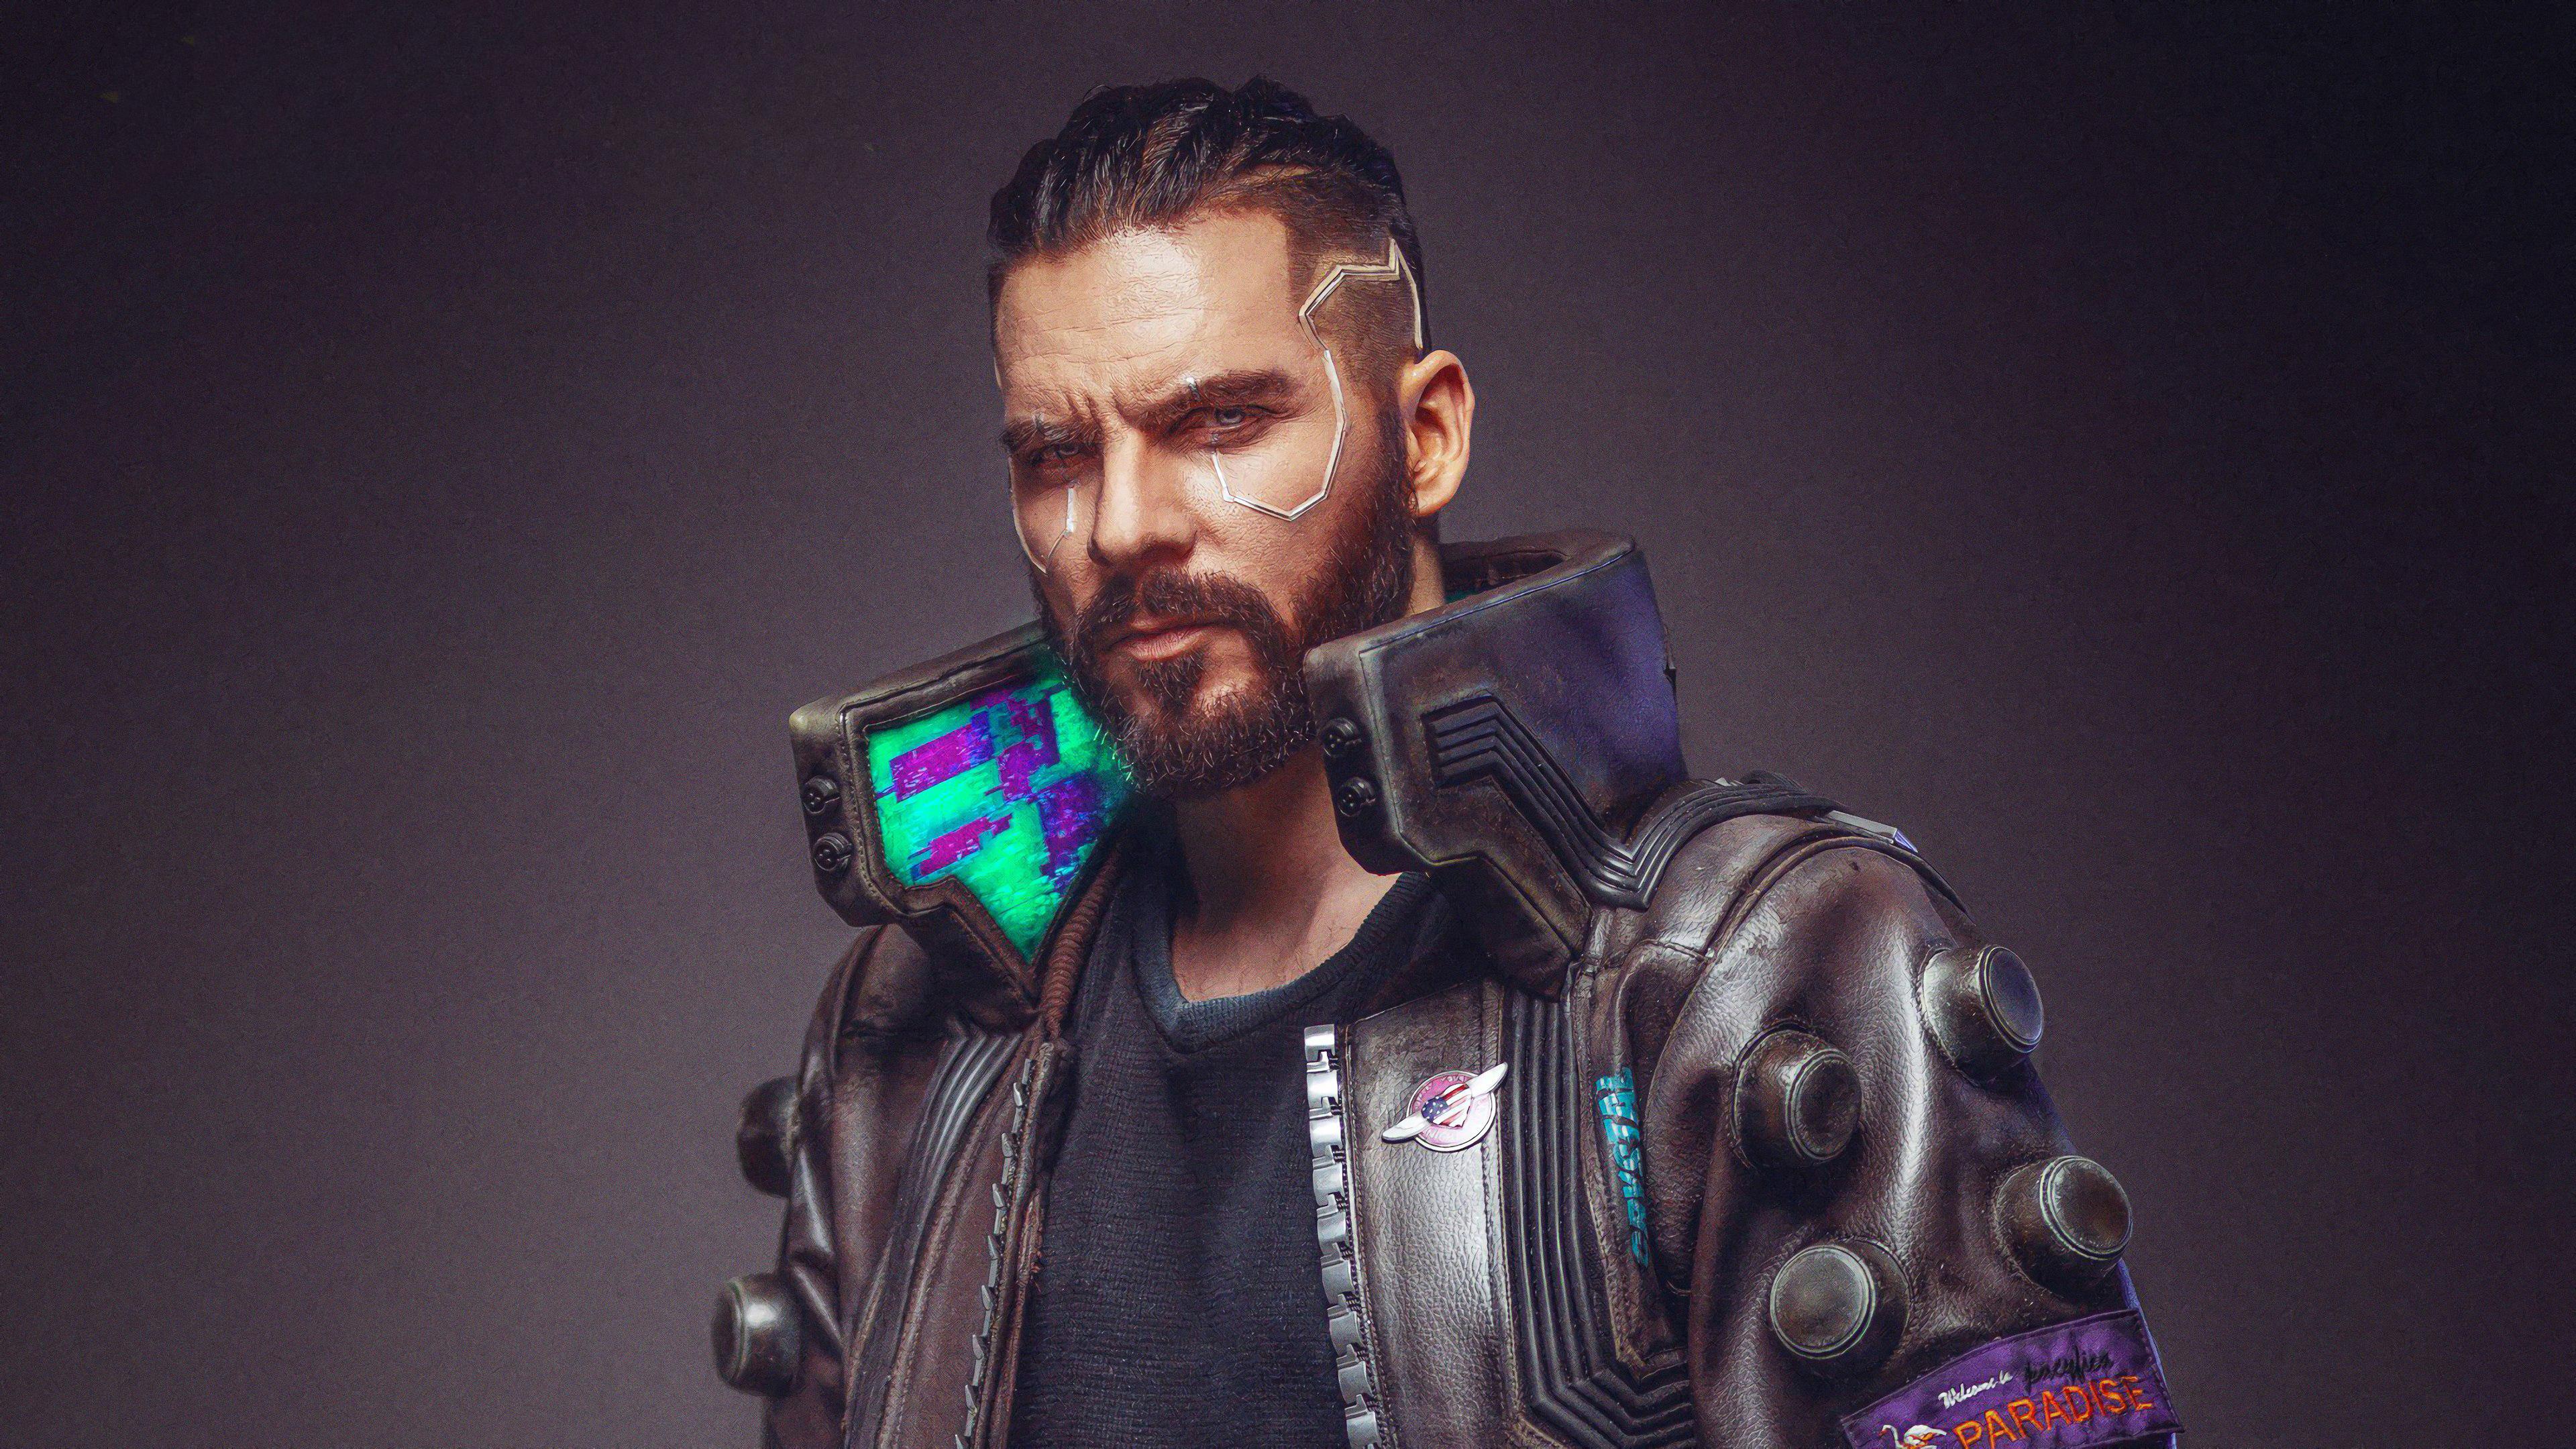 cyberpunk 2077 2019 new 1568056430 - Cyberpunk 2077 2019 New - xbox games wallpapers, ps games wallpapers, pc games wallpapers, hd-wallpapers, games wallpapers, cyberpunk 2077 wallpapers, 4k-wallpapers